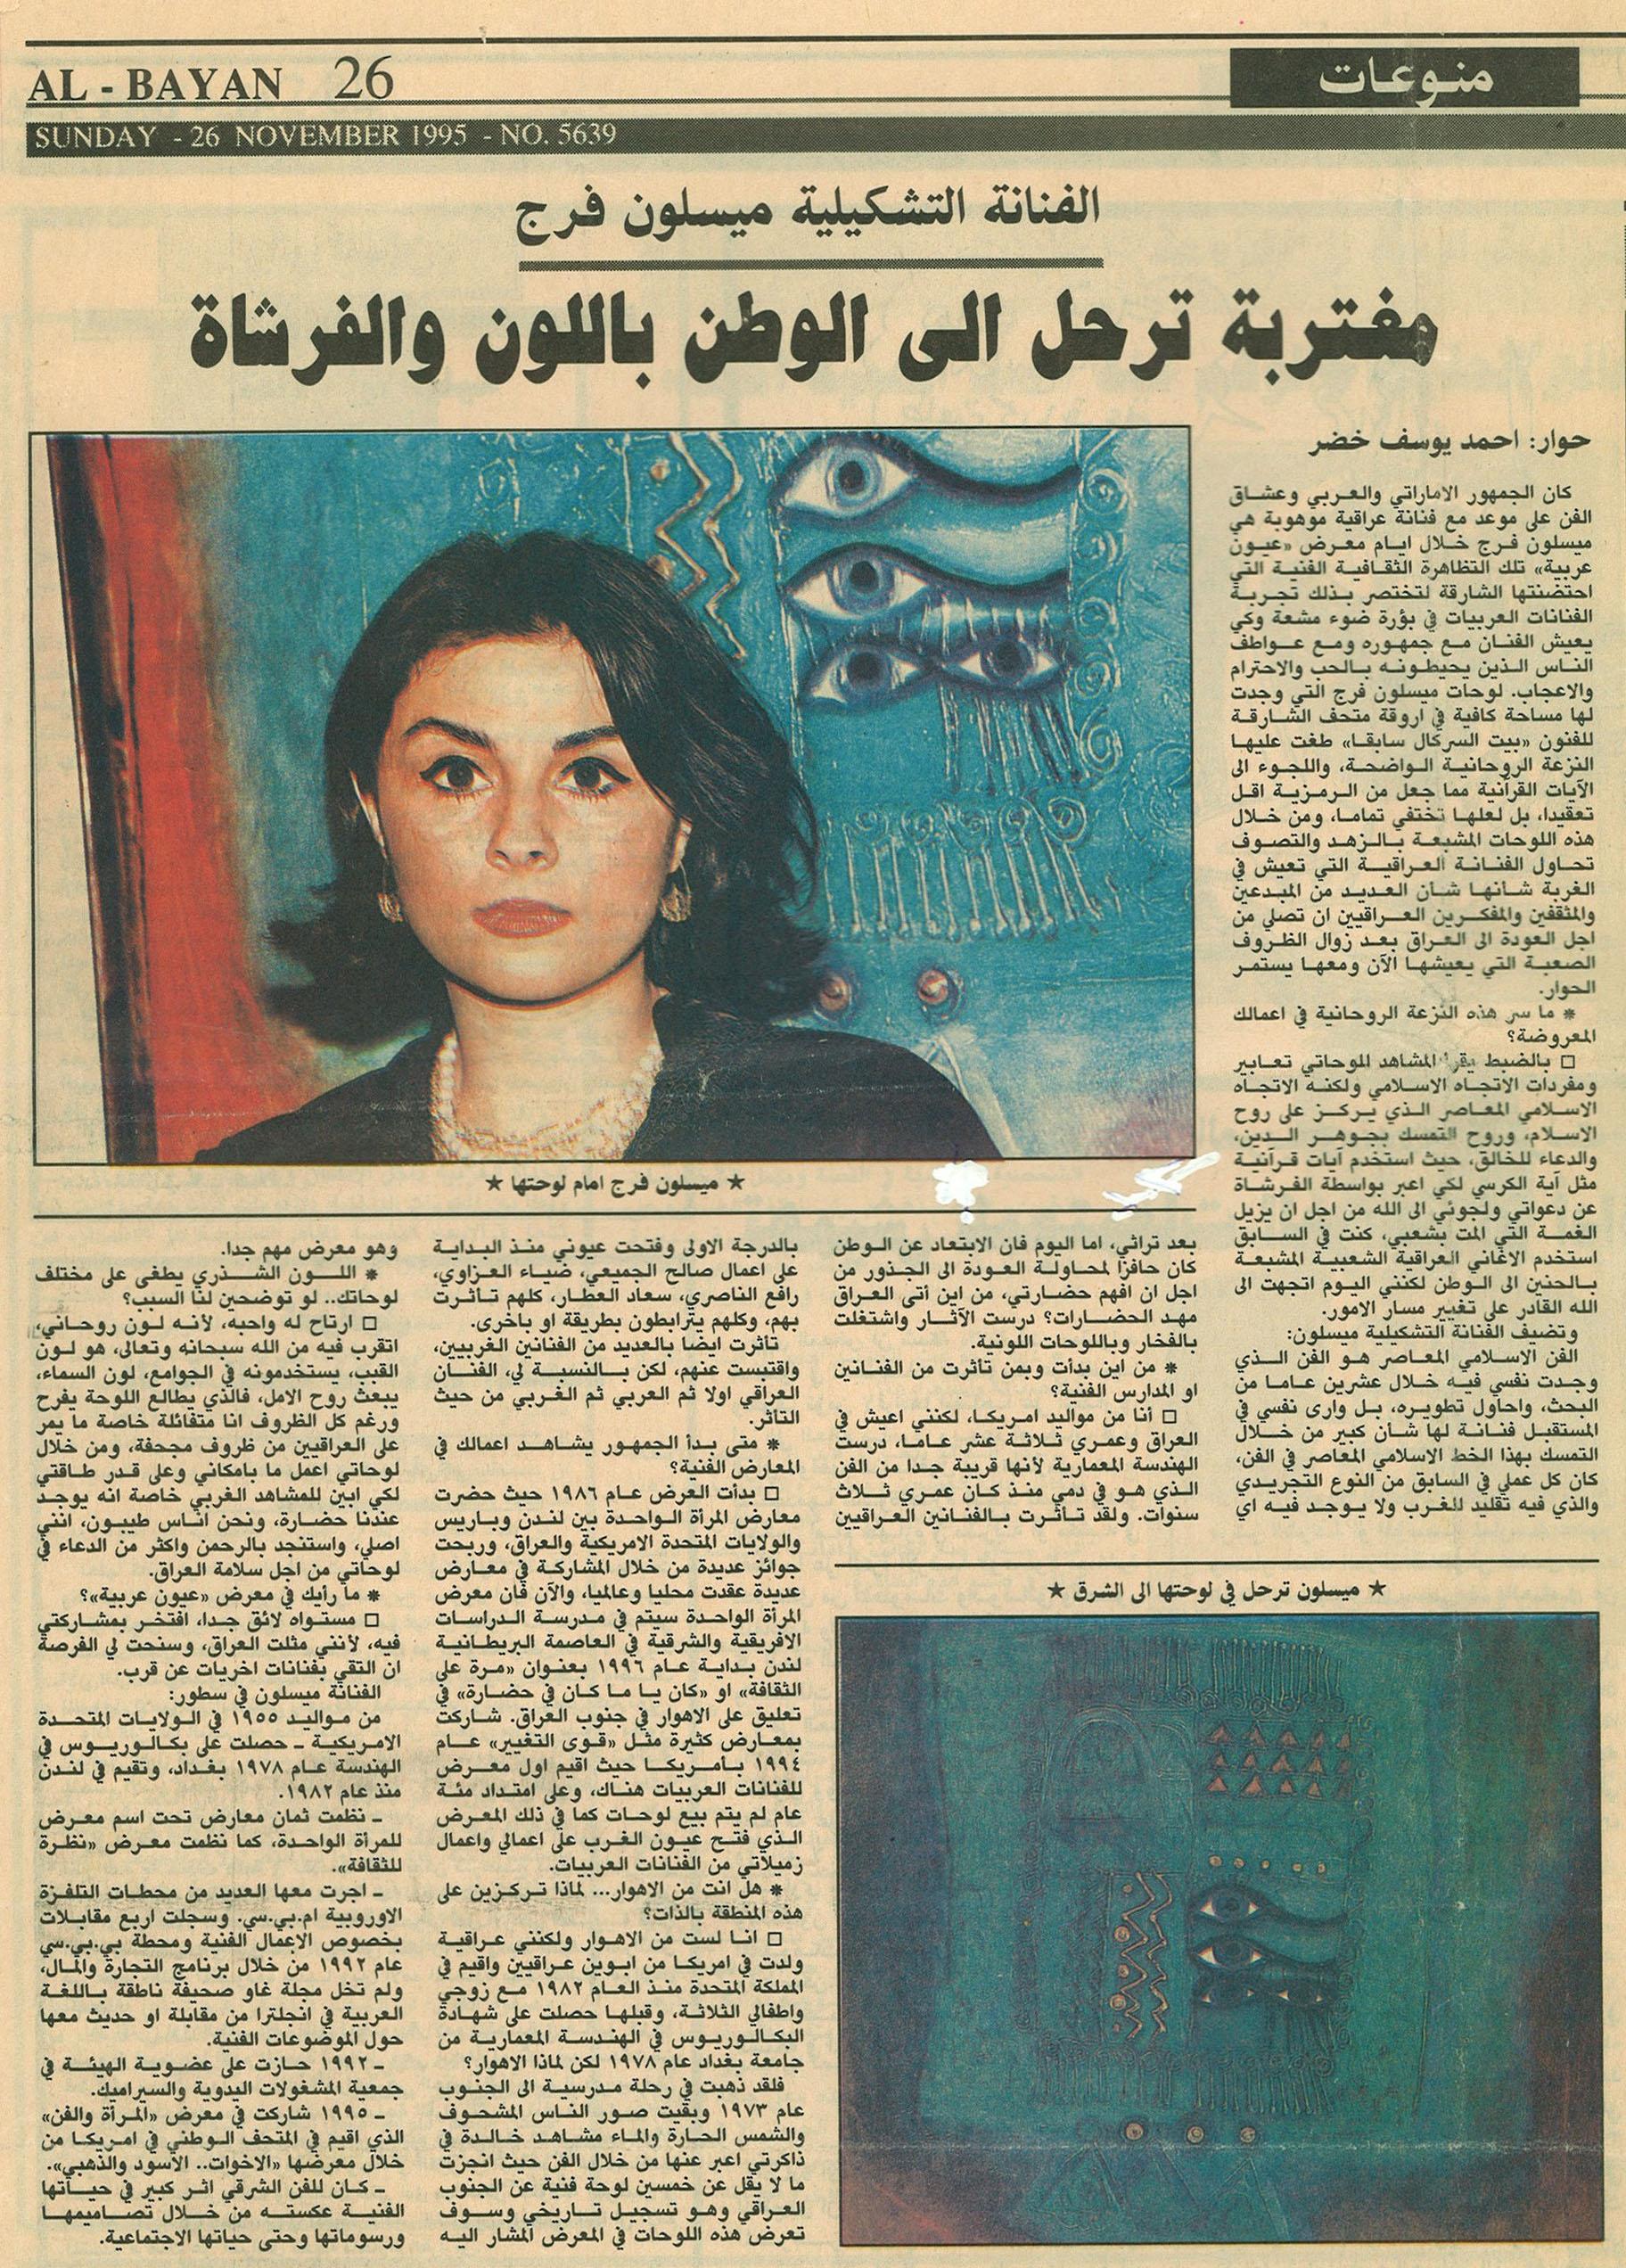 Al-Bayan  Uyoun Arabiya   Exhibition of Arab women artists at Beit al-Sirkal Sharjah UAE 1995